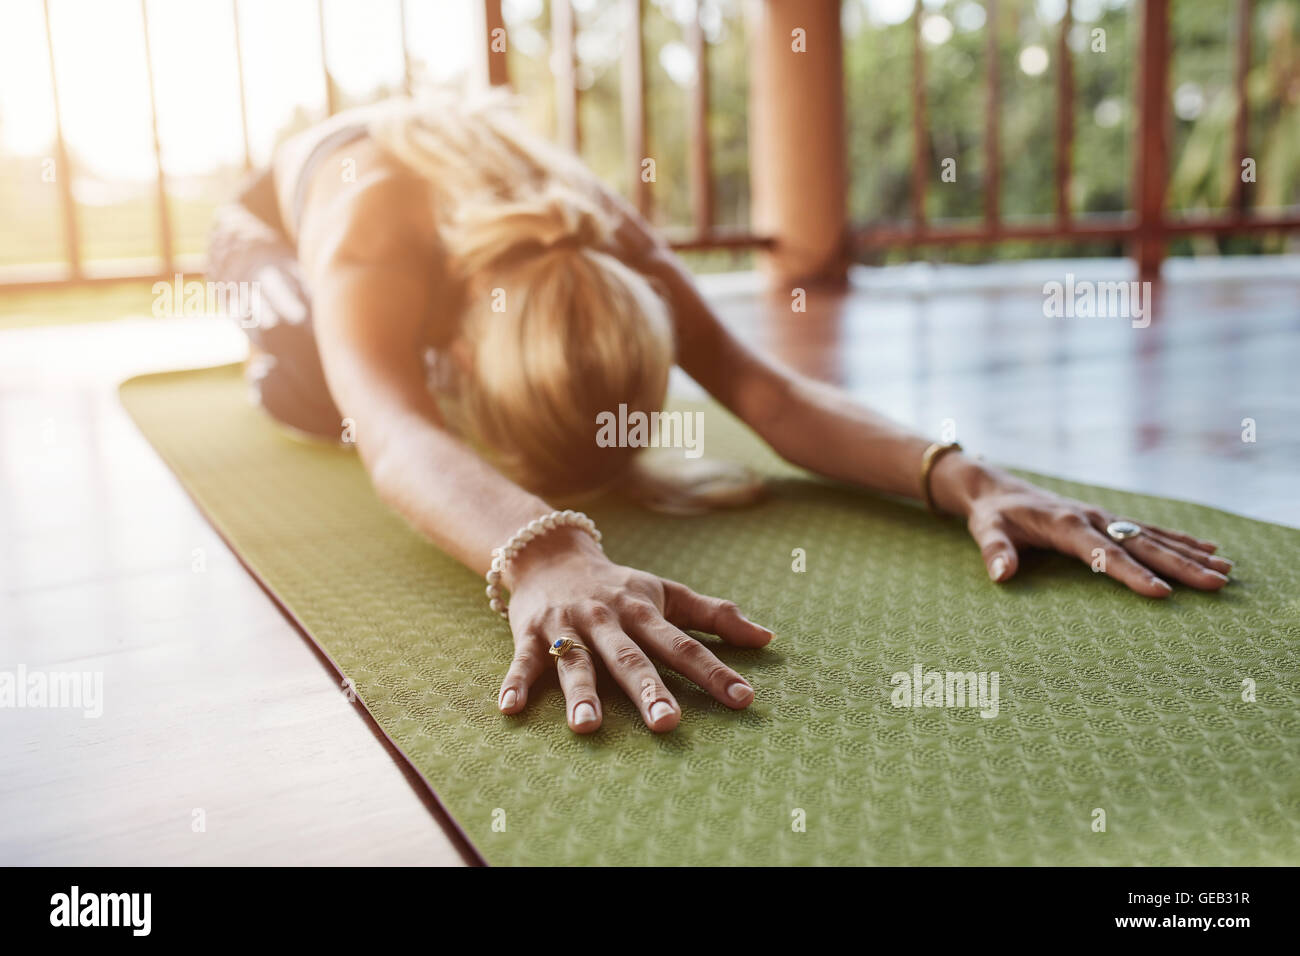 Woman stretching forward, performing a yoga pose on exercise mat. Fitness female performing balasana yoga at gym, Stock Photo